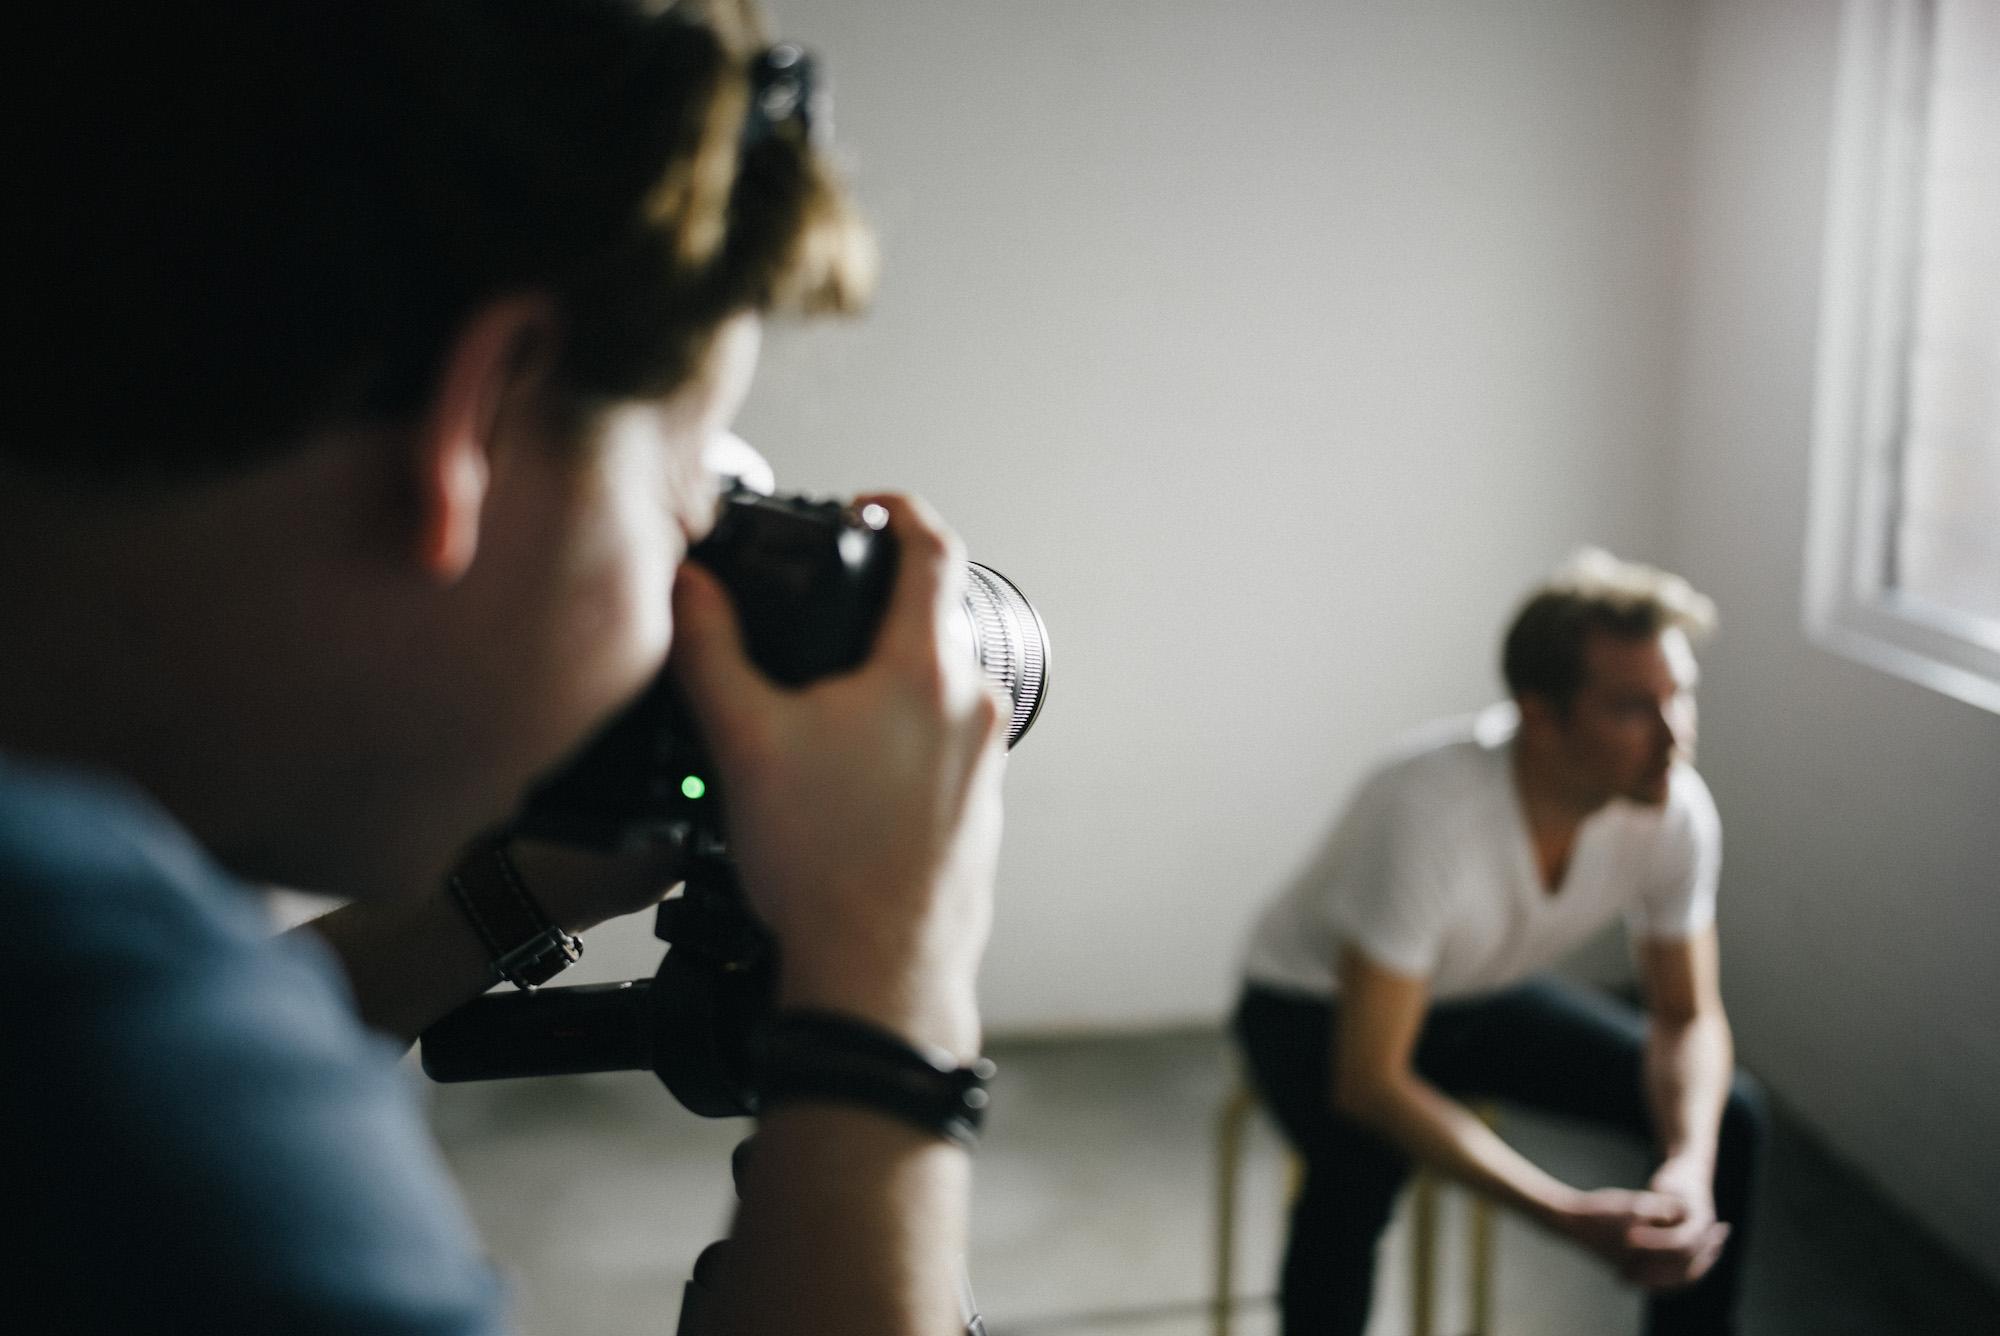 20170715__015347-Nick-Bedford,-Photographer-Leica M Typ 240, Portrait, Robin Anthony Darch, Tyler Alberti, Voigtlander 35mm F1.7 Ultron Asph, VSCO Film.jpg